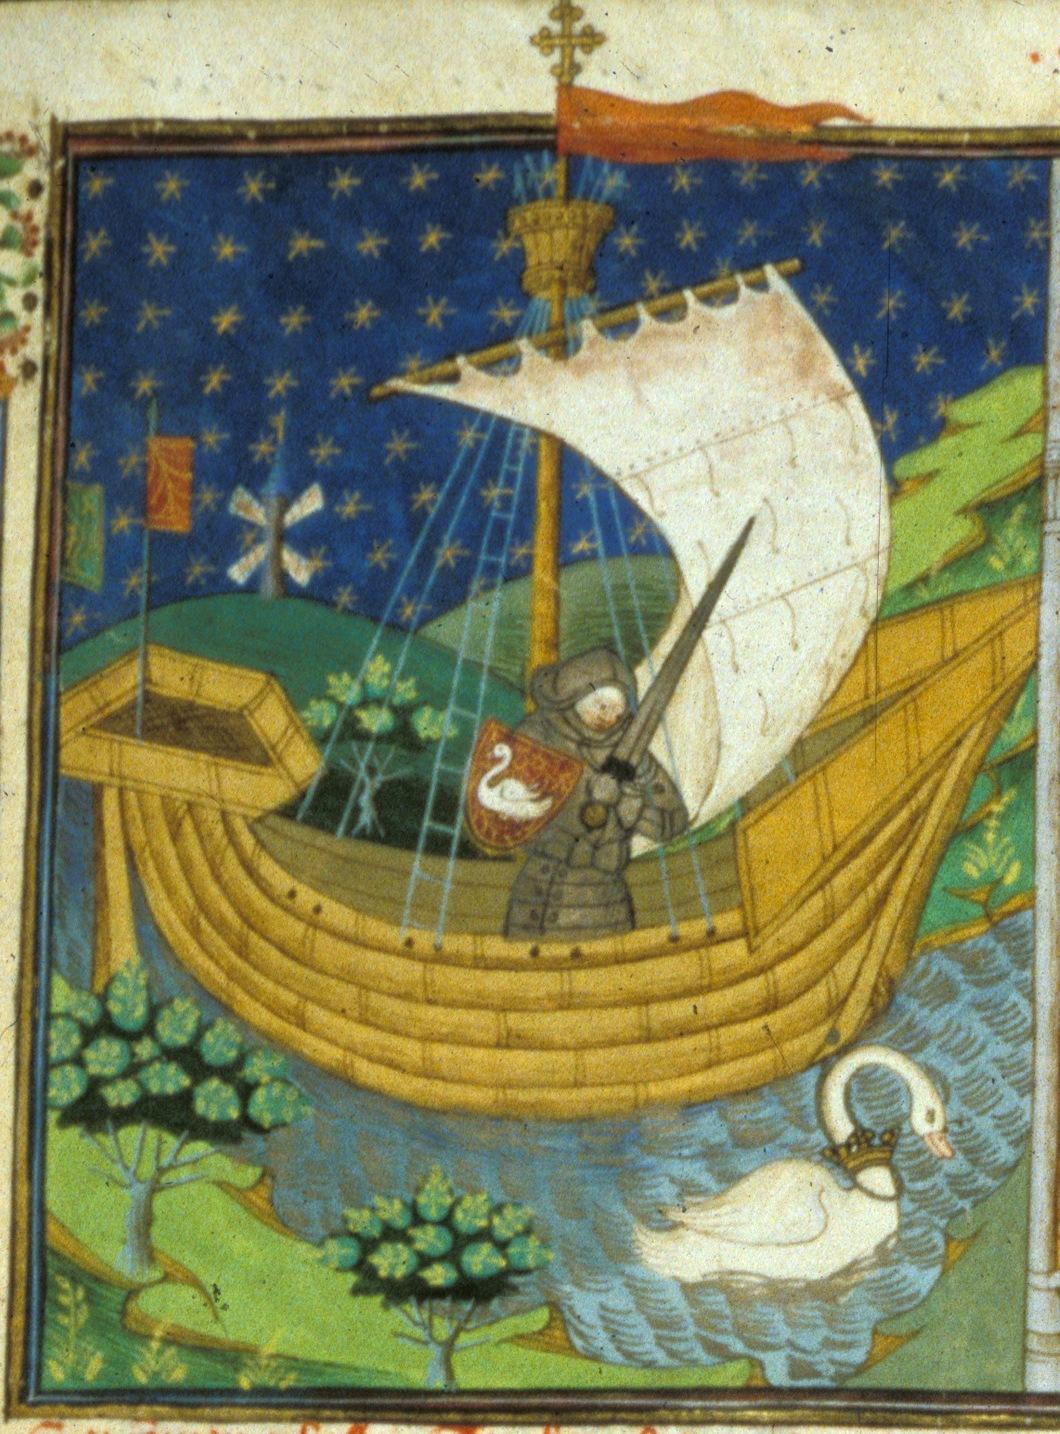 A_knight_in_a_boat_drawn_by_a_swan_(British_Library_Royal_15_E_VI,_f_273).jpg